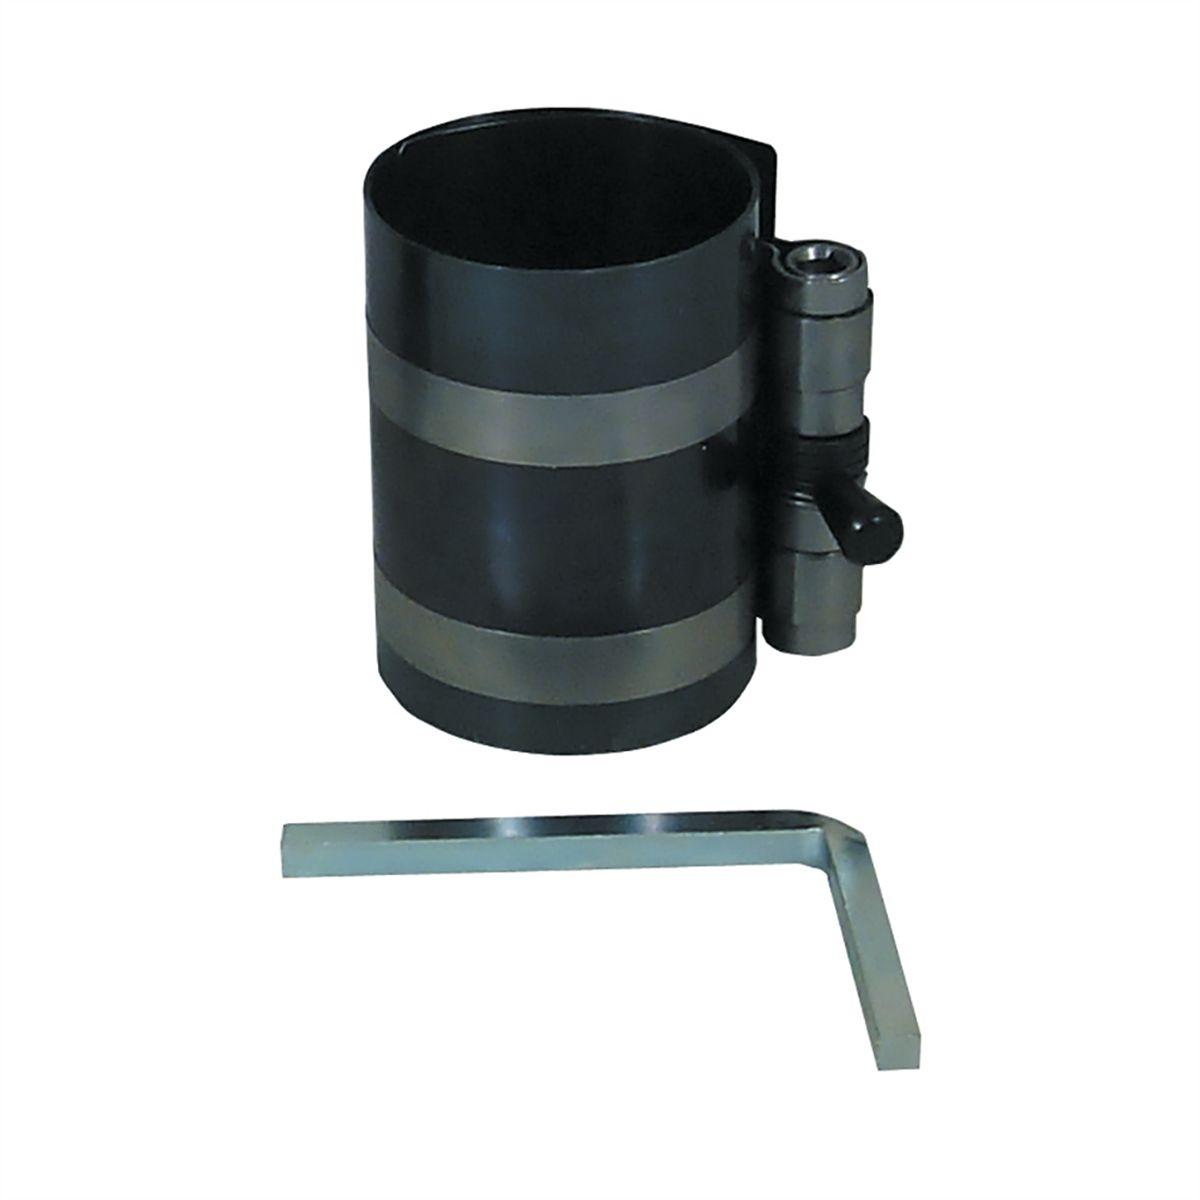 Piston Ring Compressor - 3 1/2 In to 7 In Range - 3 1/2 In High